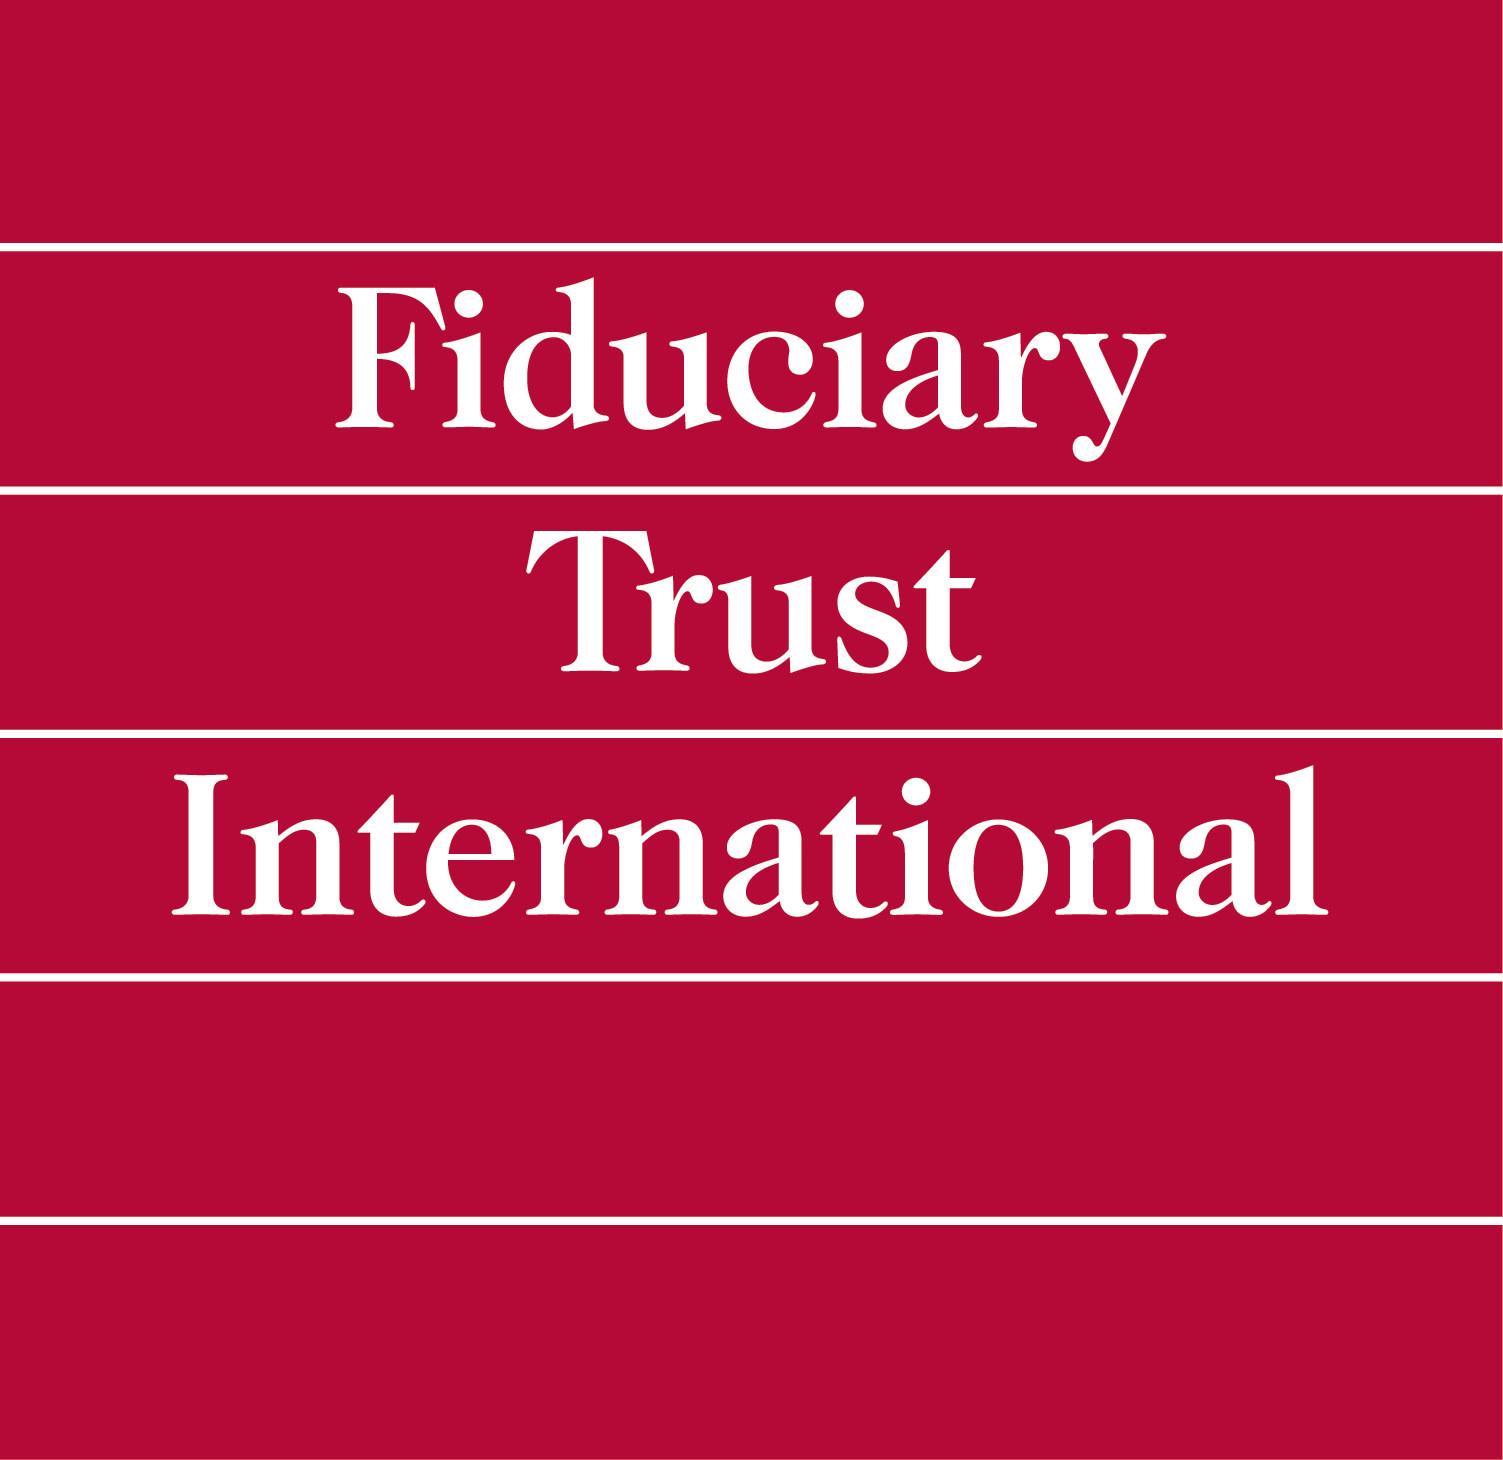 Fiduciary Trust International of California